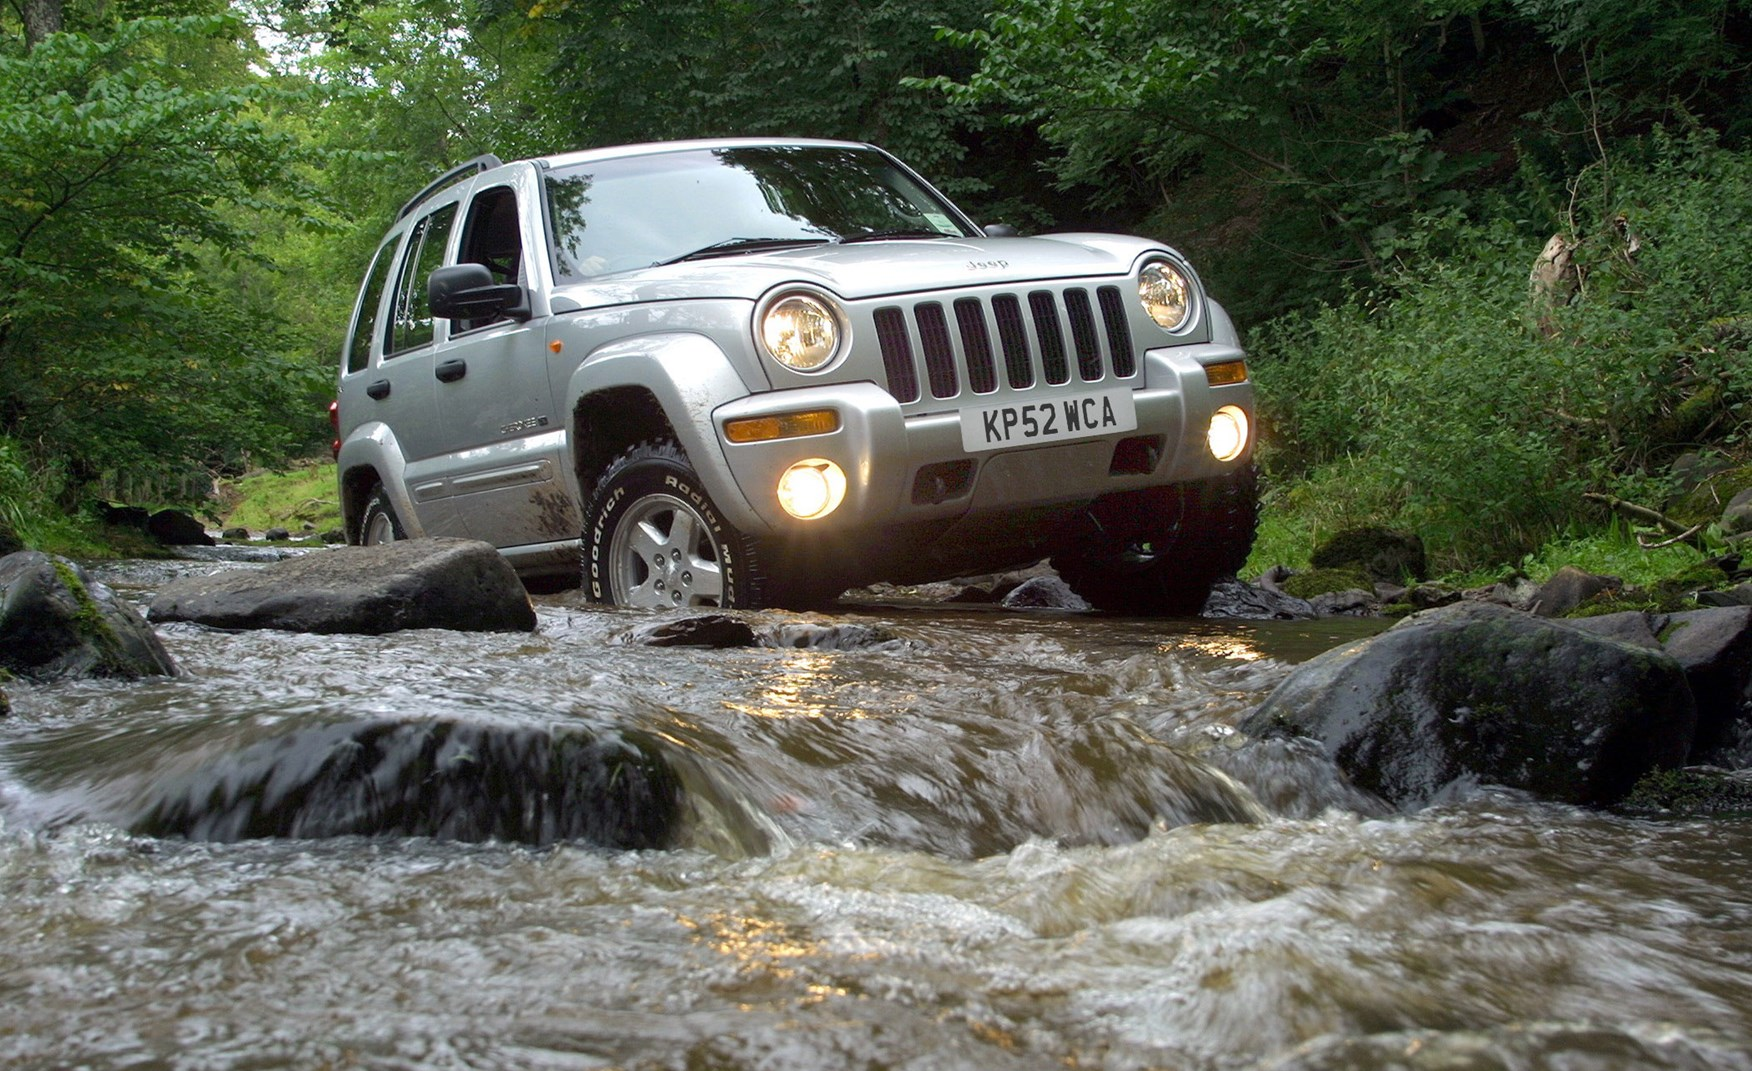 2017 Jeep Renegade Adventure Seeking Compact Suv 2017 Jeep